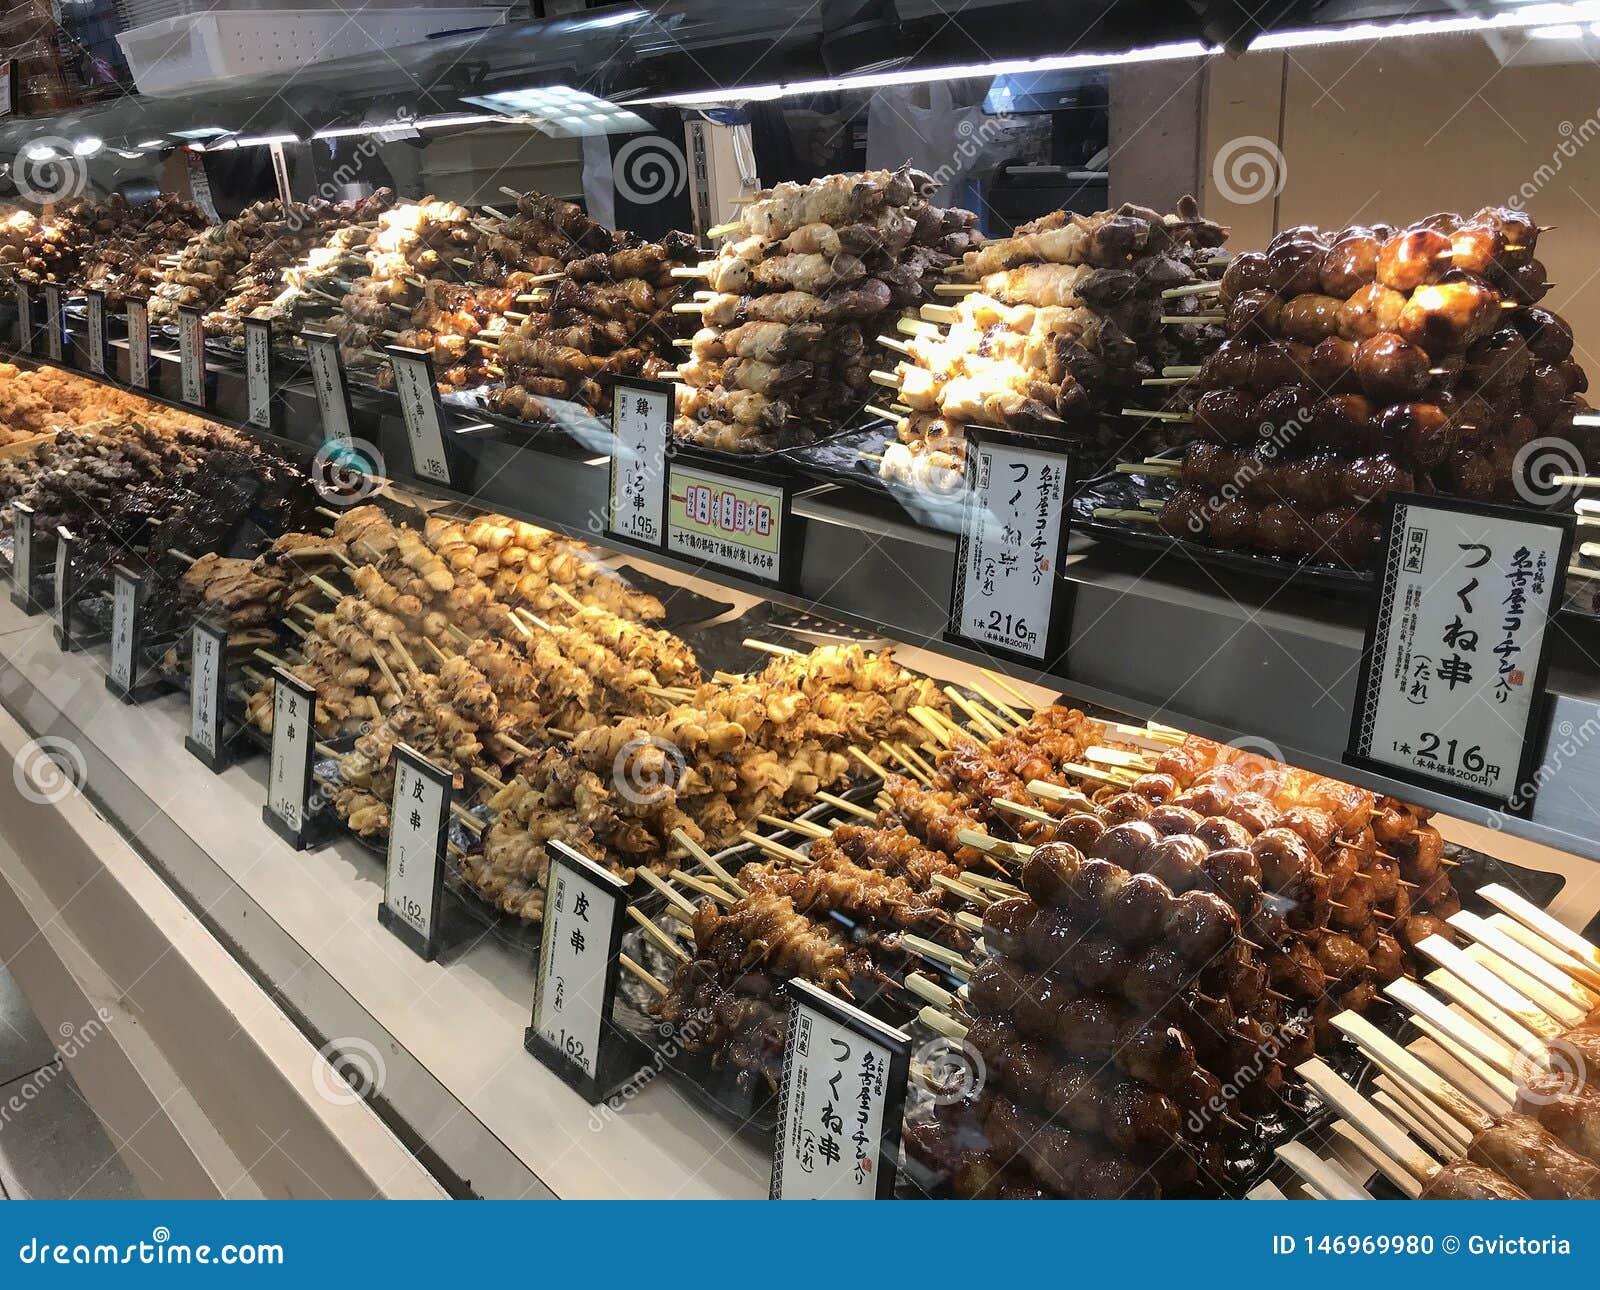 Yakitori έτοιμο για την πώληση σε έναν ψημένο στη σχάρα μετρητή κρέατος στο Κιότο, Ιαπωνία